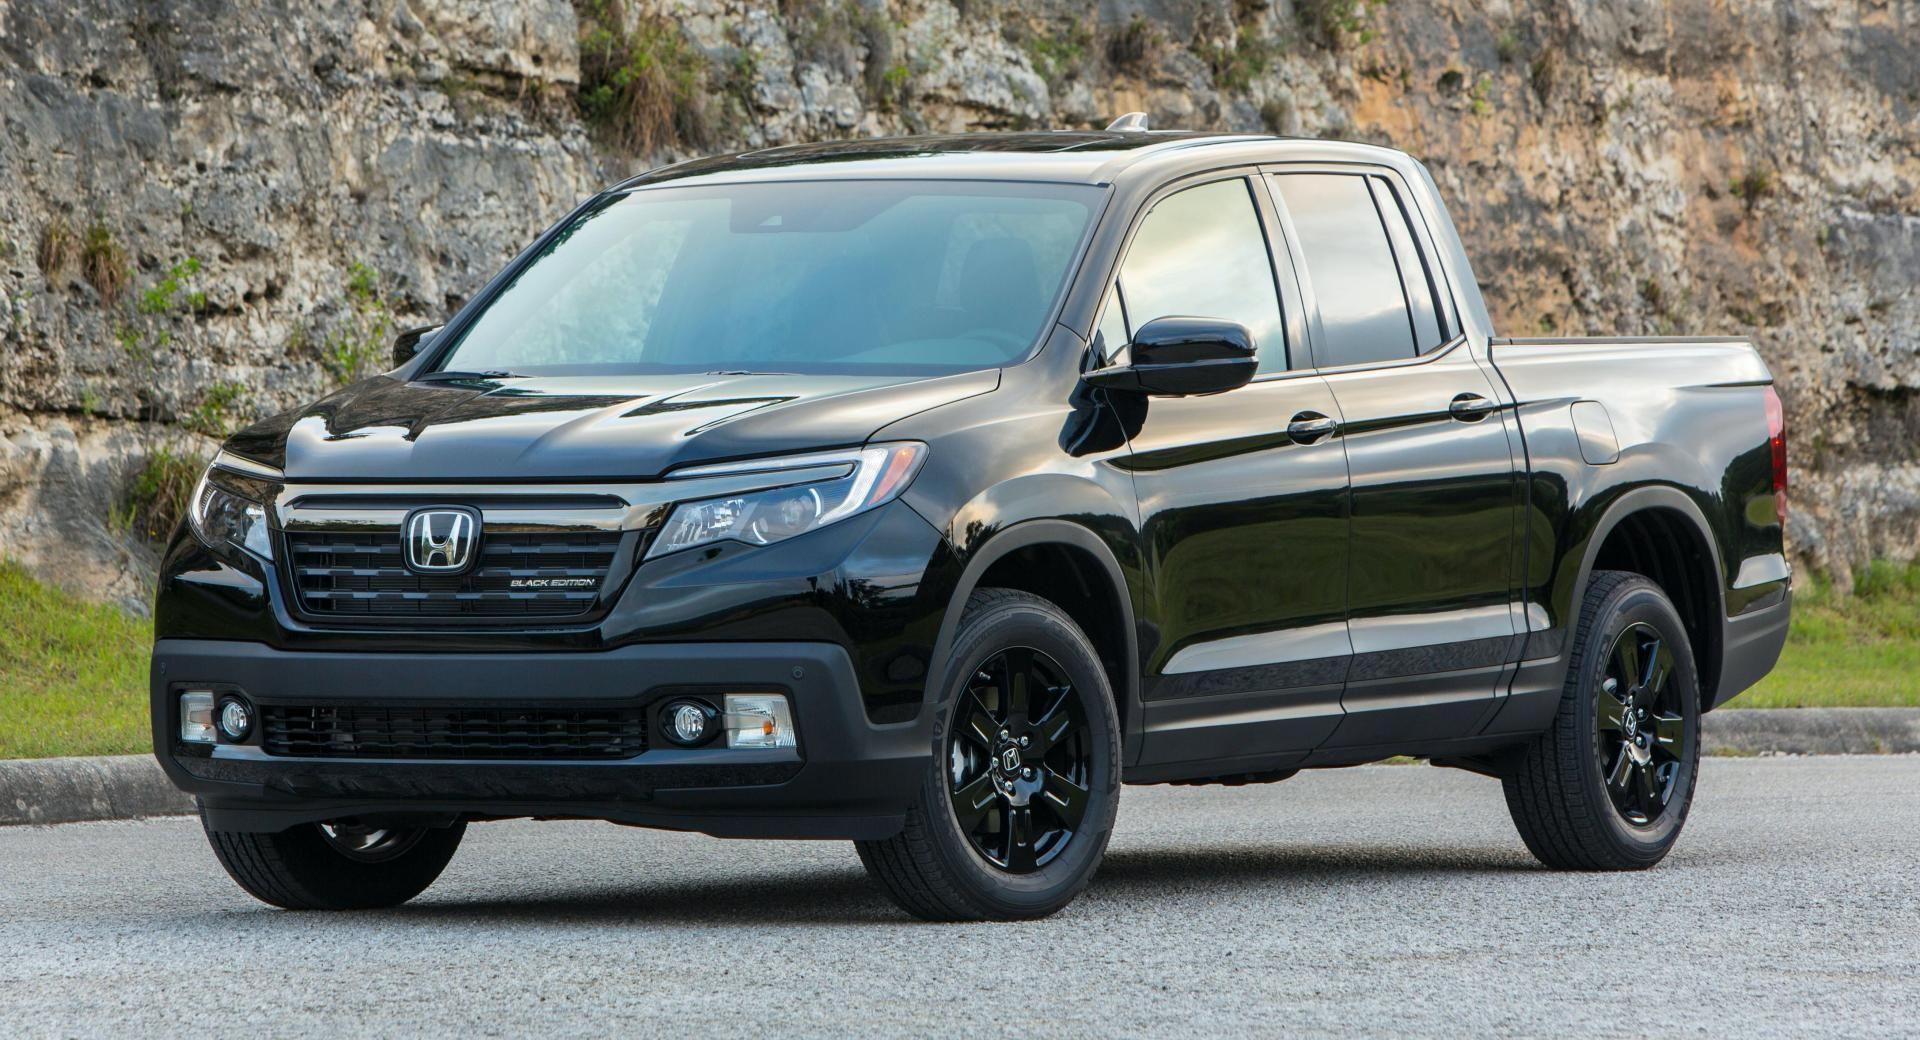 2020 Honda Ridgeline Gains Standard 9Speed Auto And More